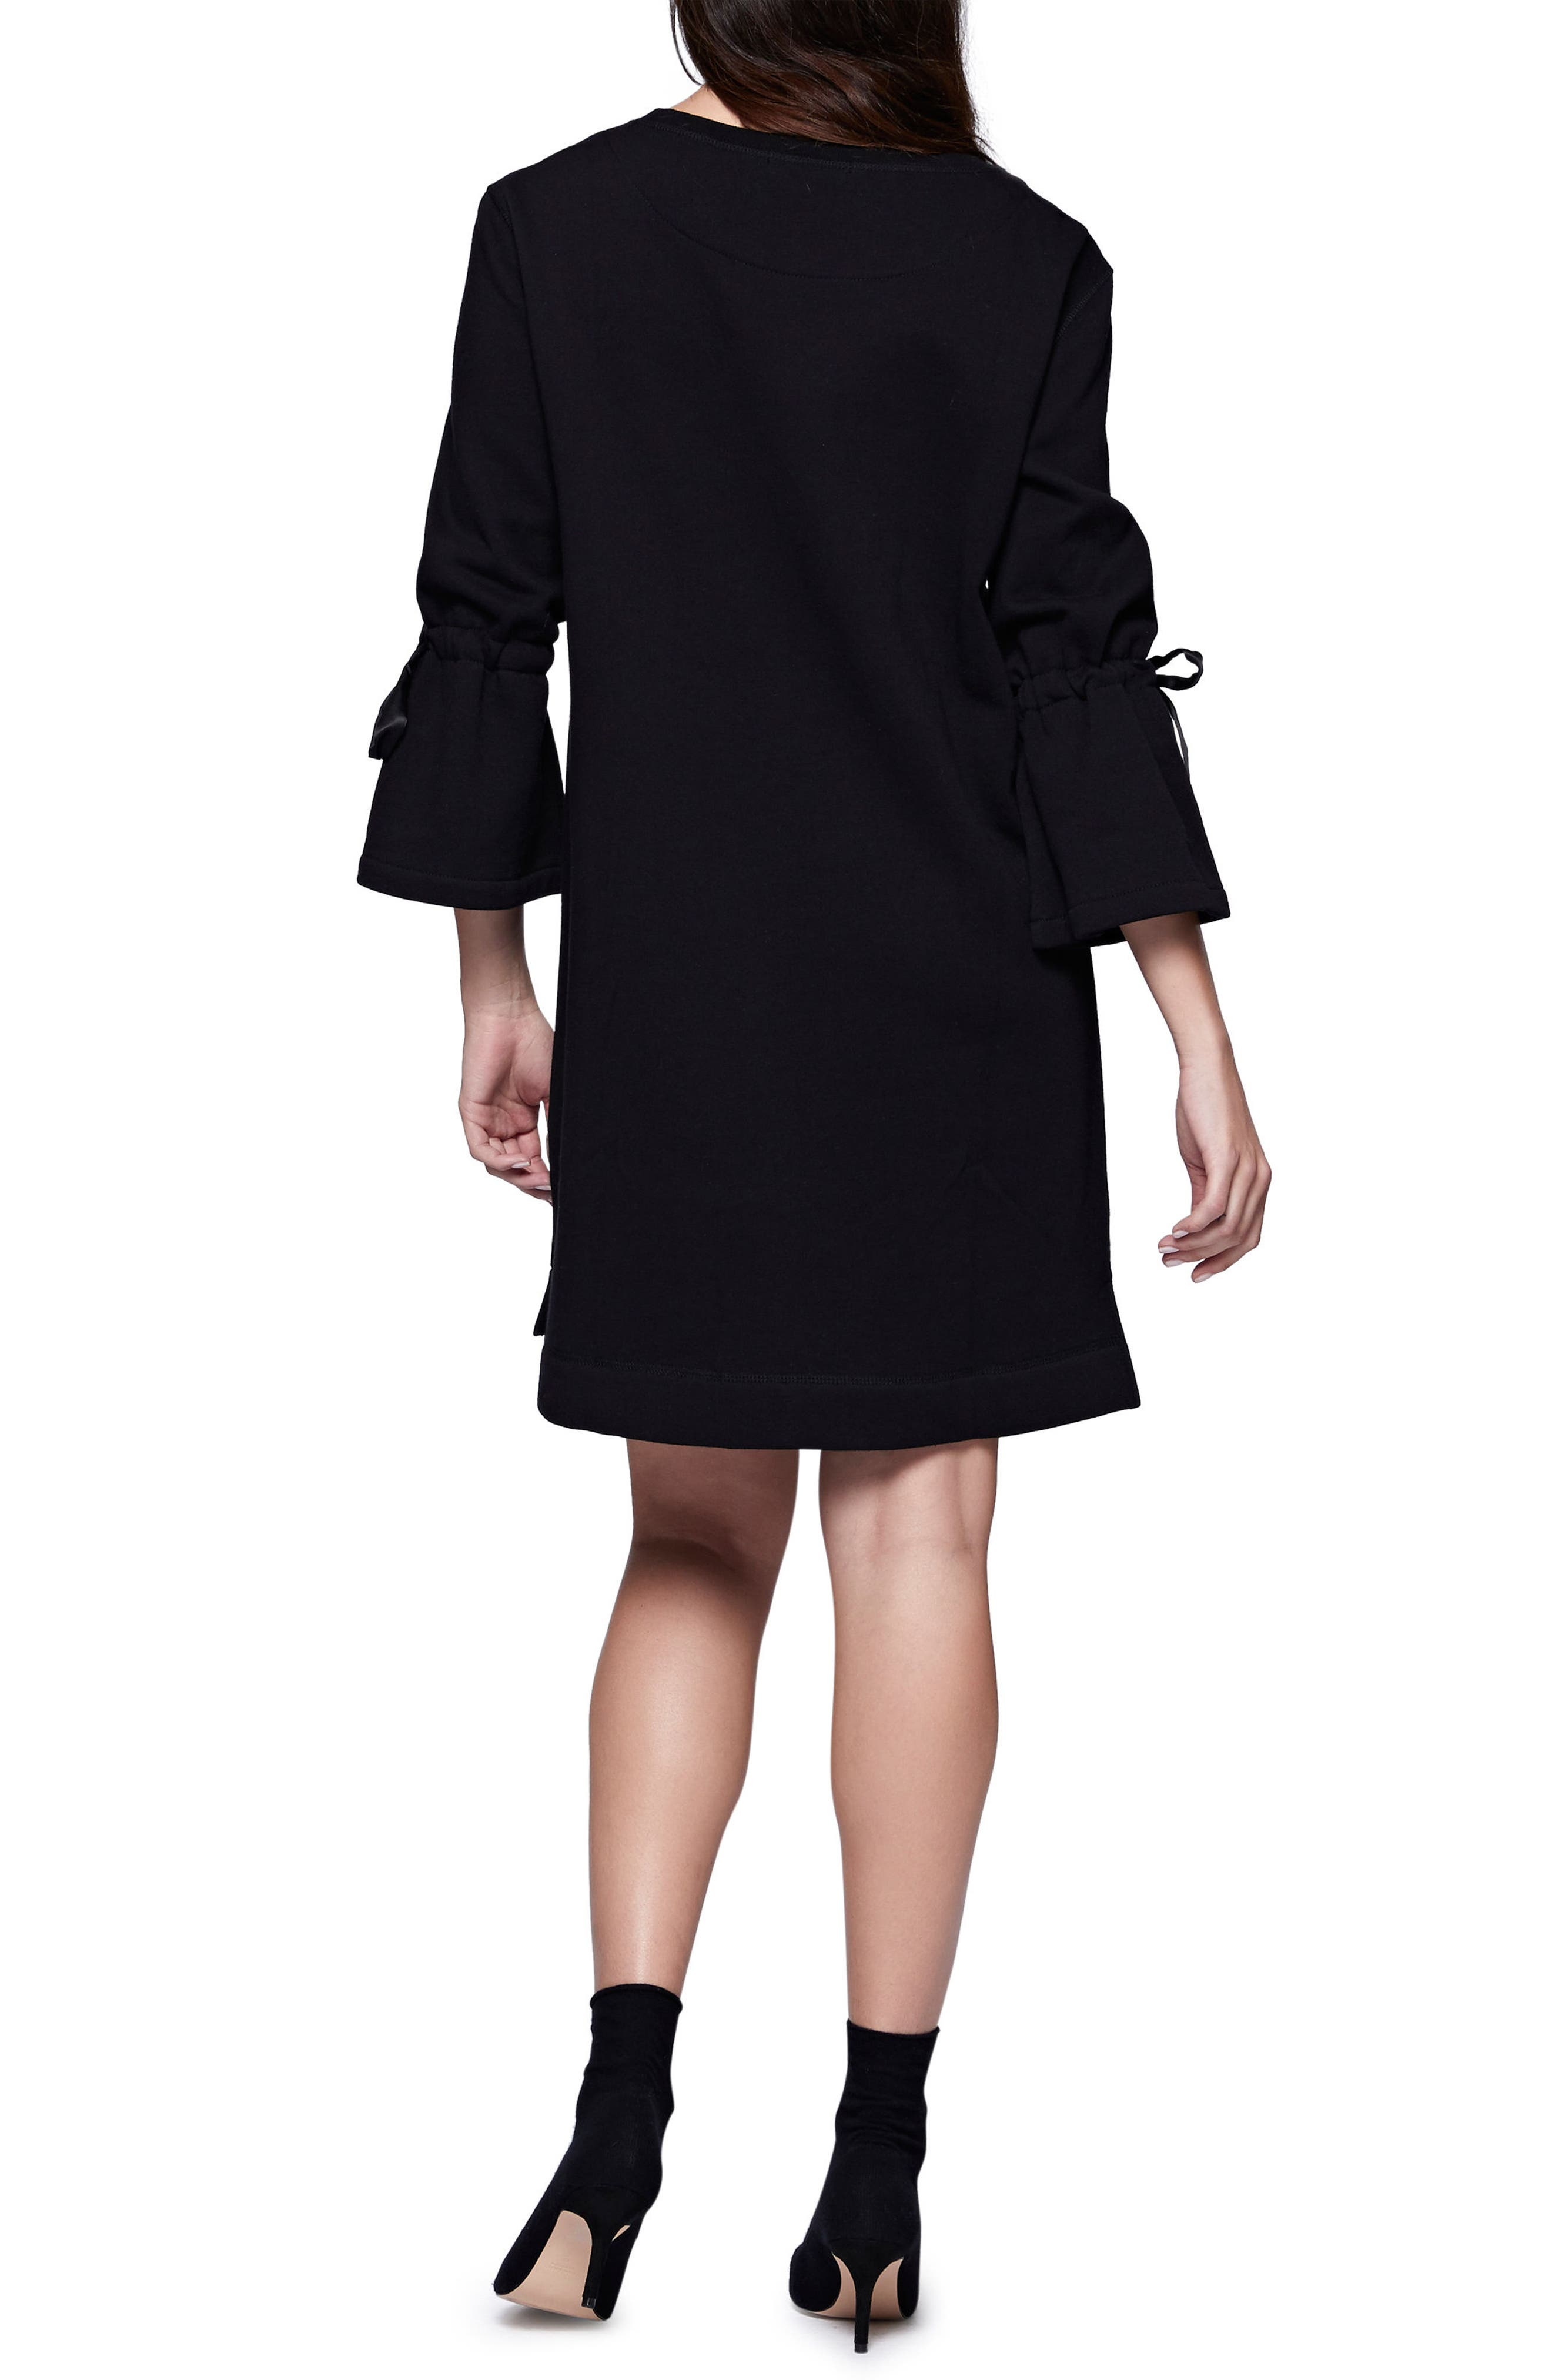 Bell Sleeve Sweatshirt Dress,                             Alternate thumbnail 2, color,                             Black